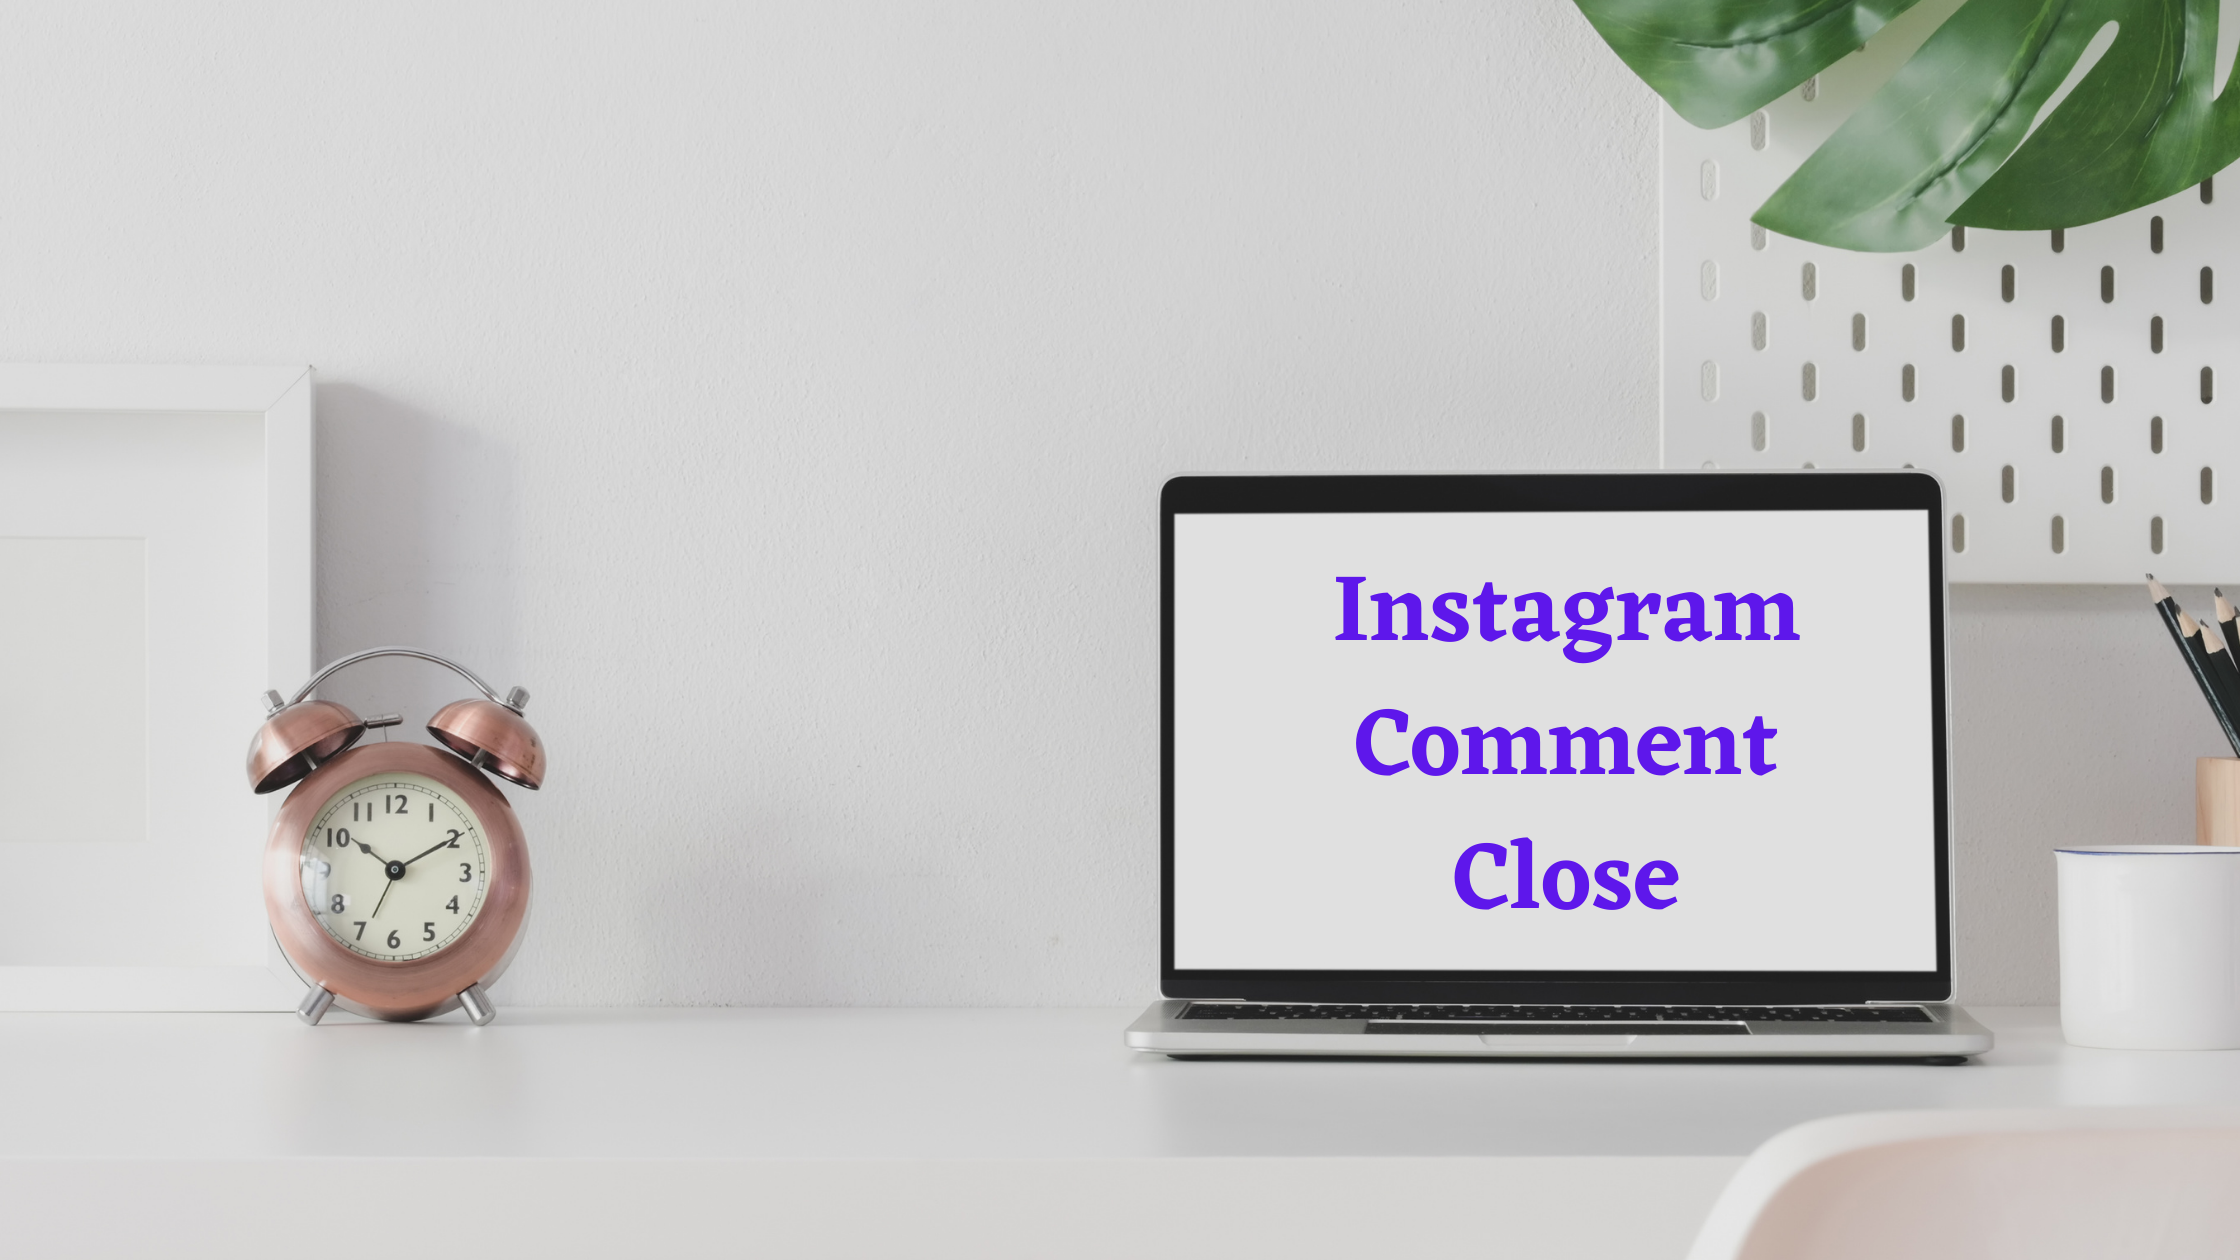 Instagram Comment Close